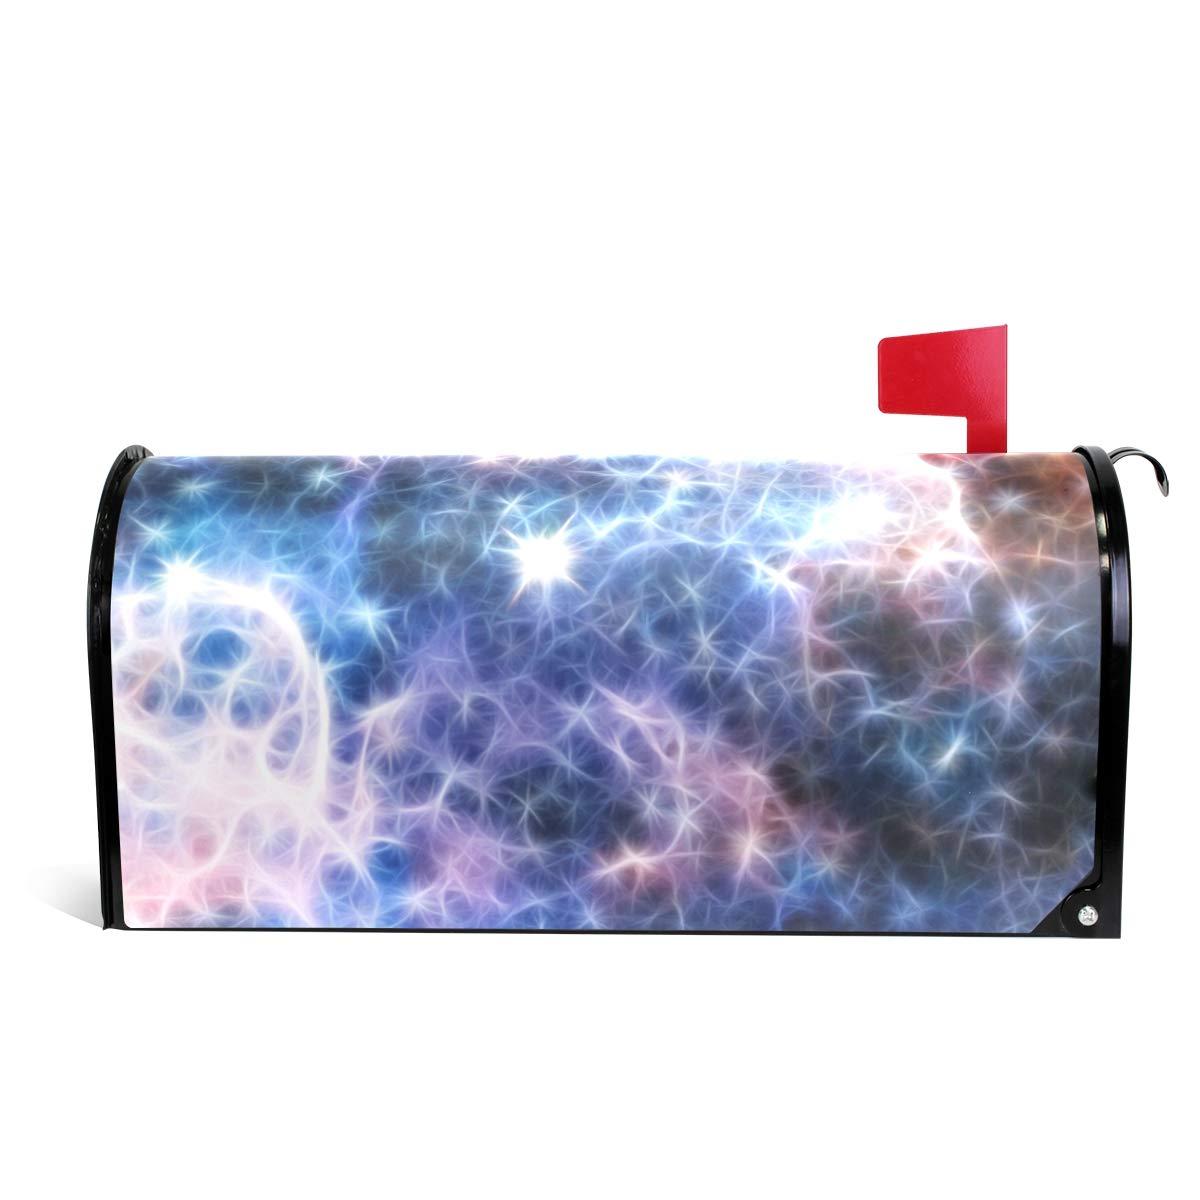 MAPOLO Infrared Light Carina Nebula Magnetic Mailbox Cover Oversized